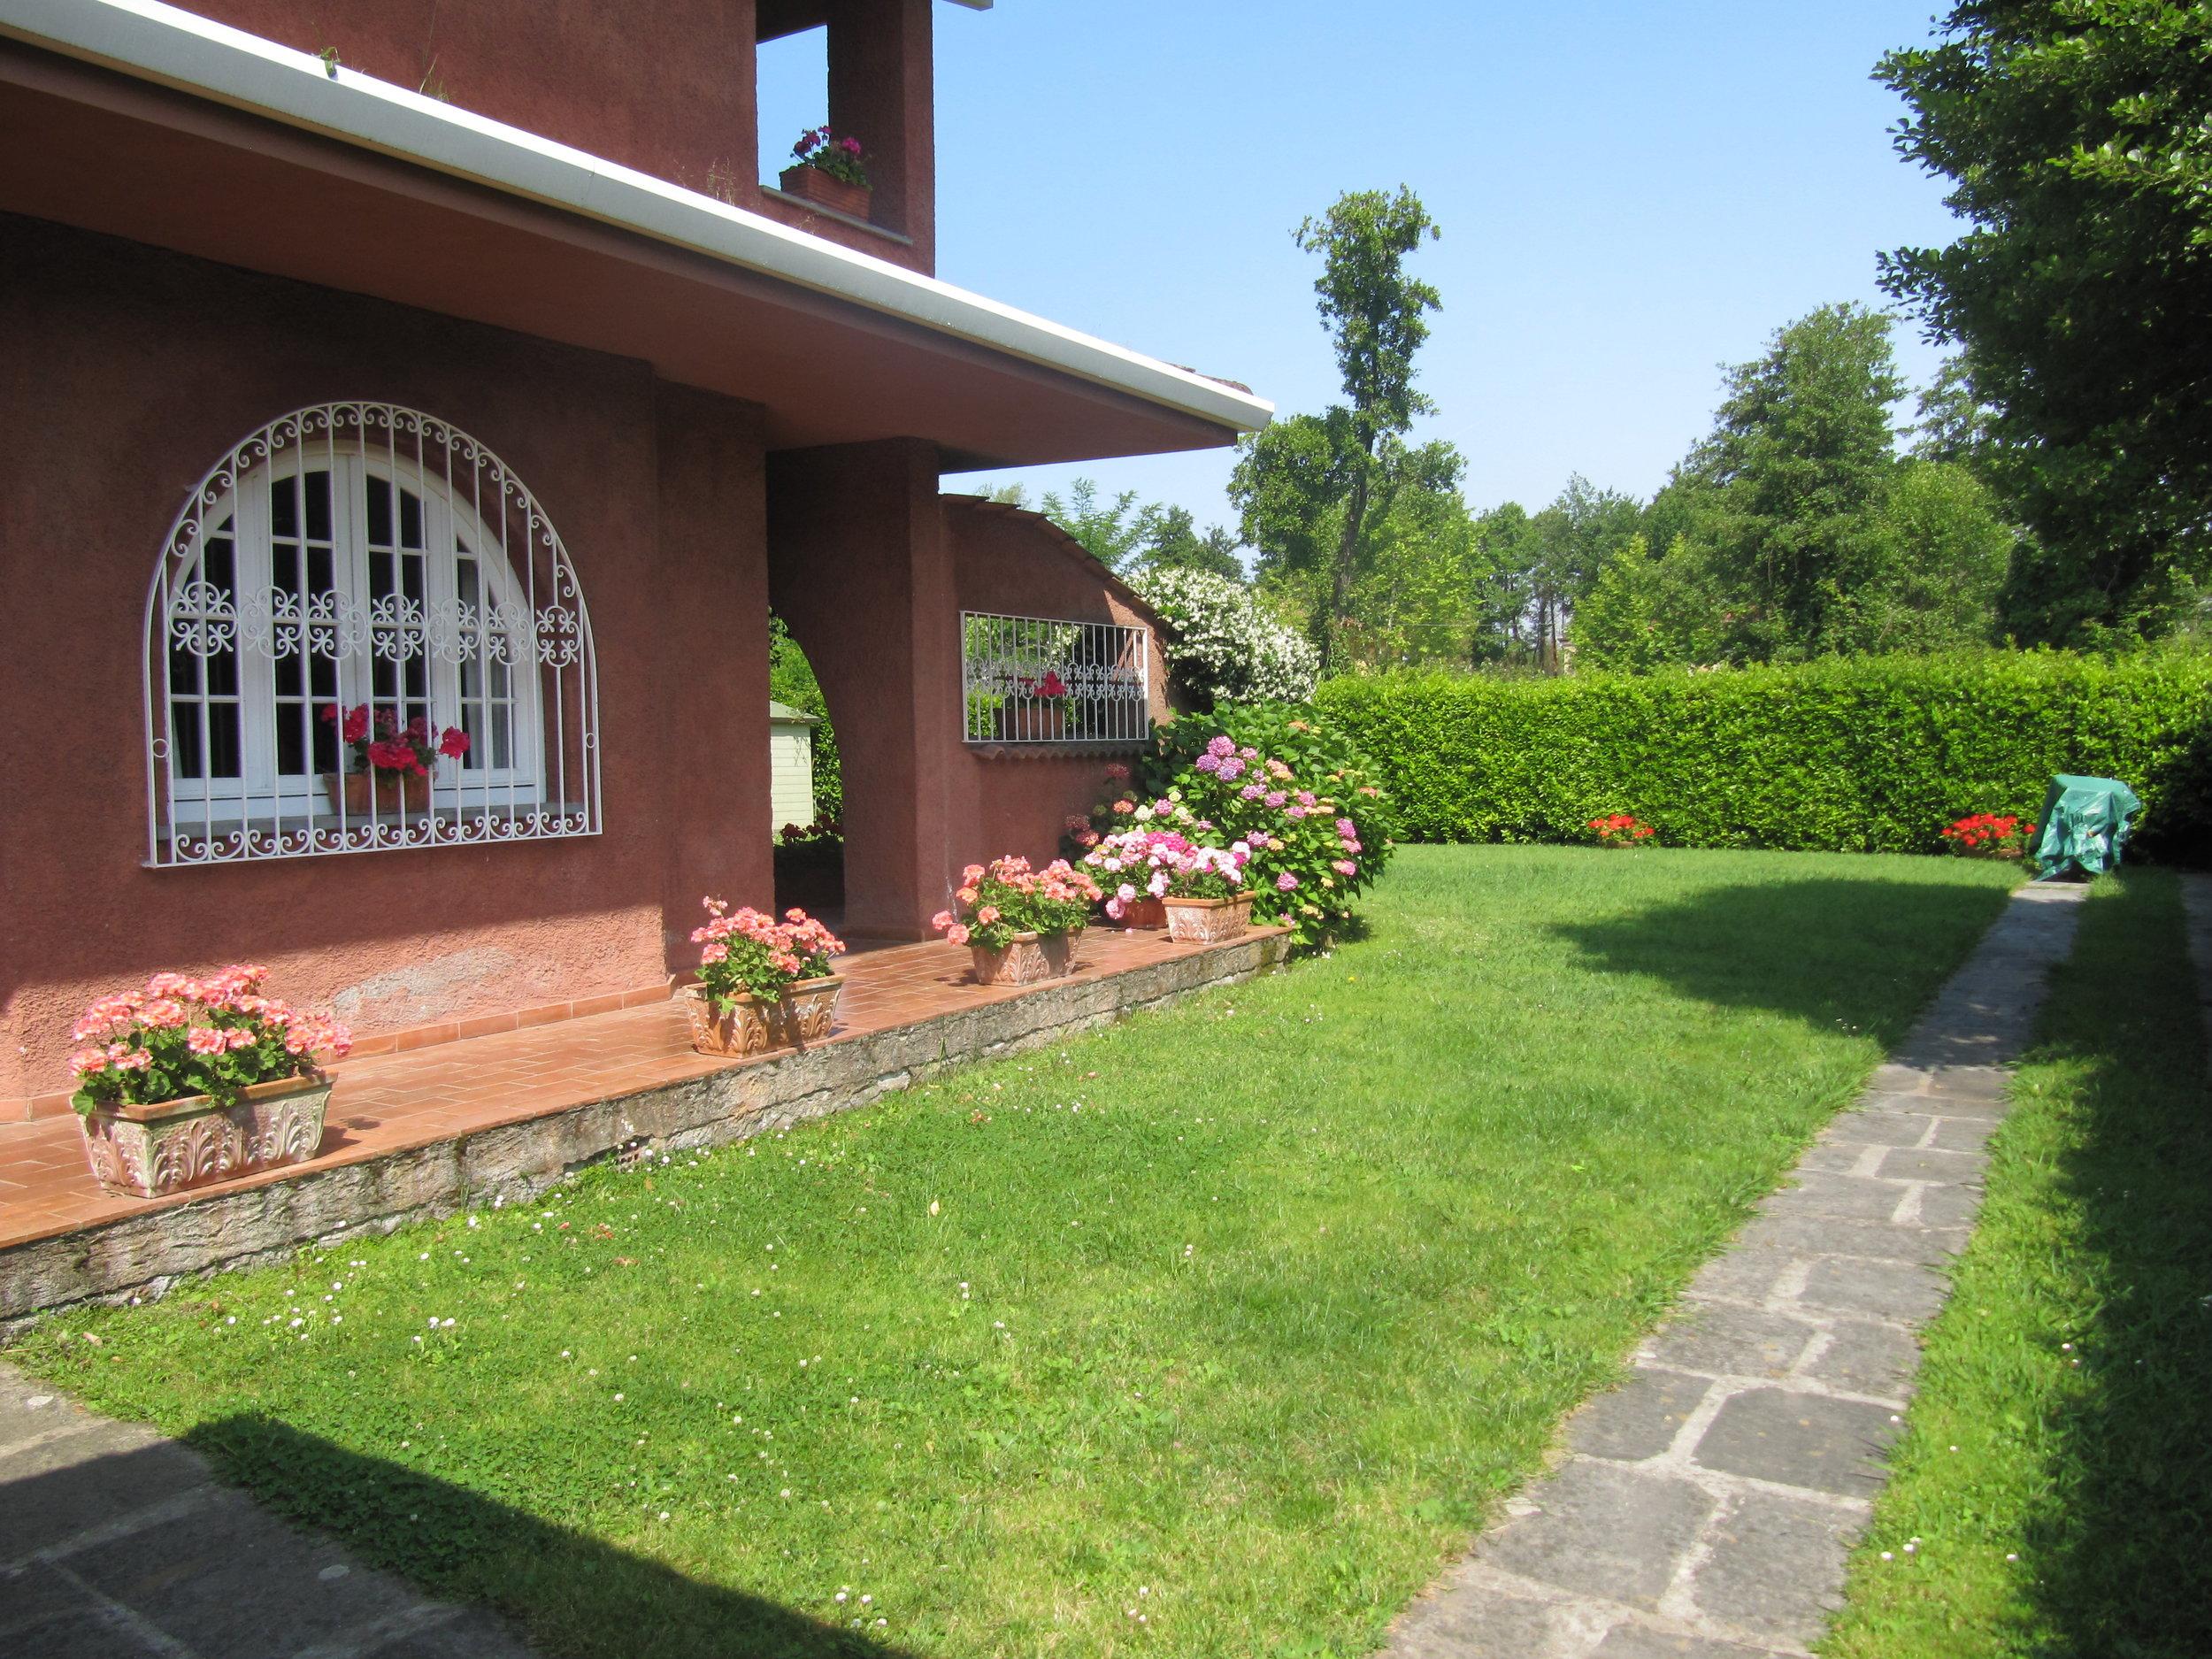 holiday-villa-forte-dei-marmi-car-park.JPG